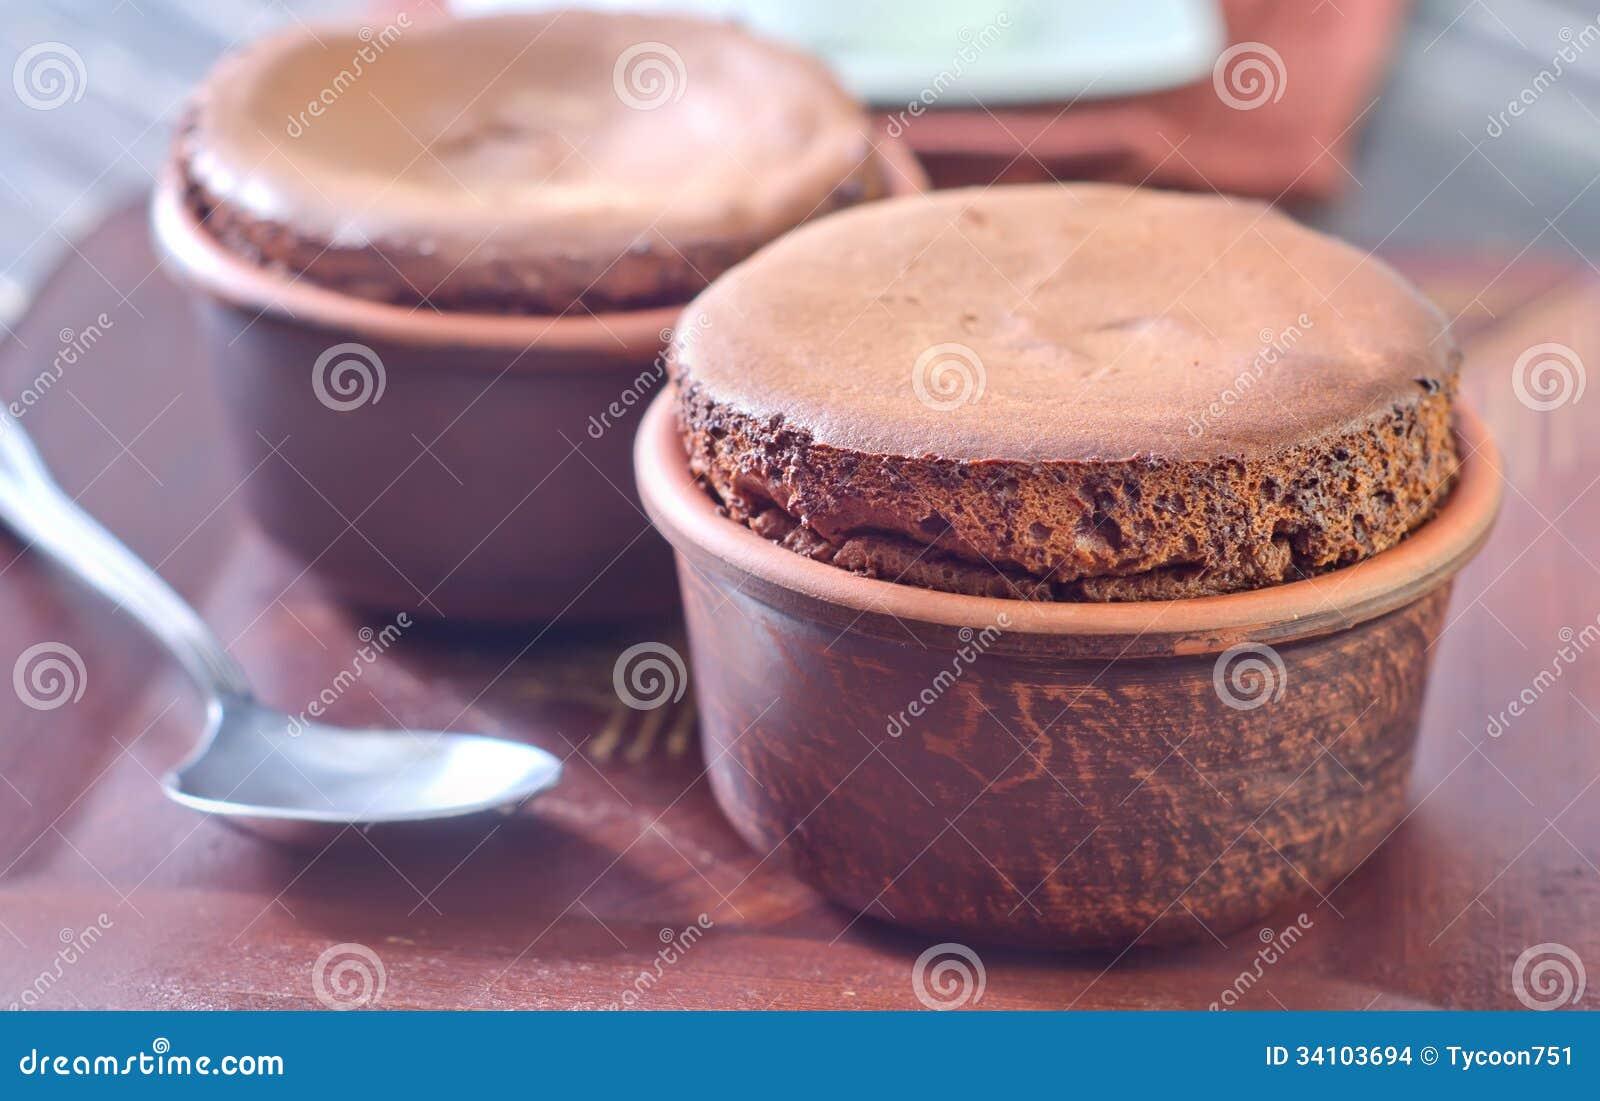 ... chocolate espresso snowcaps chocolate espresso mini souffles